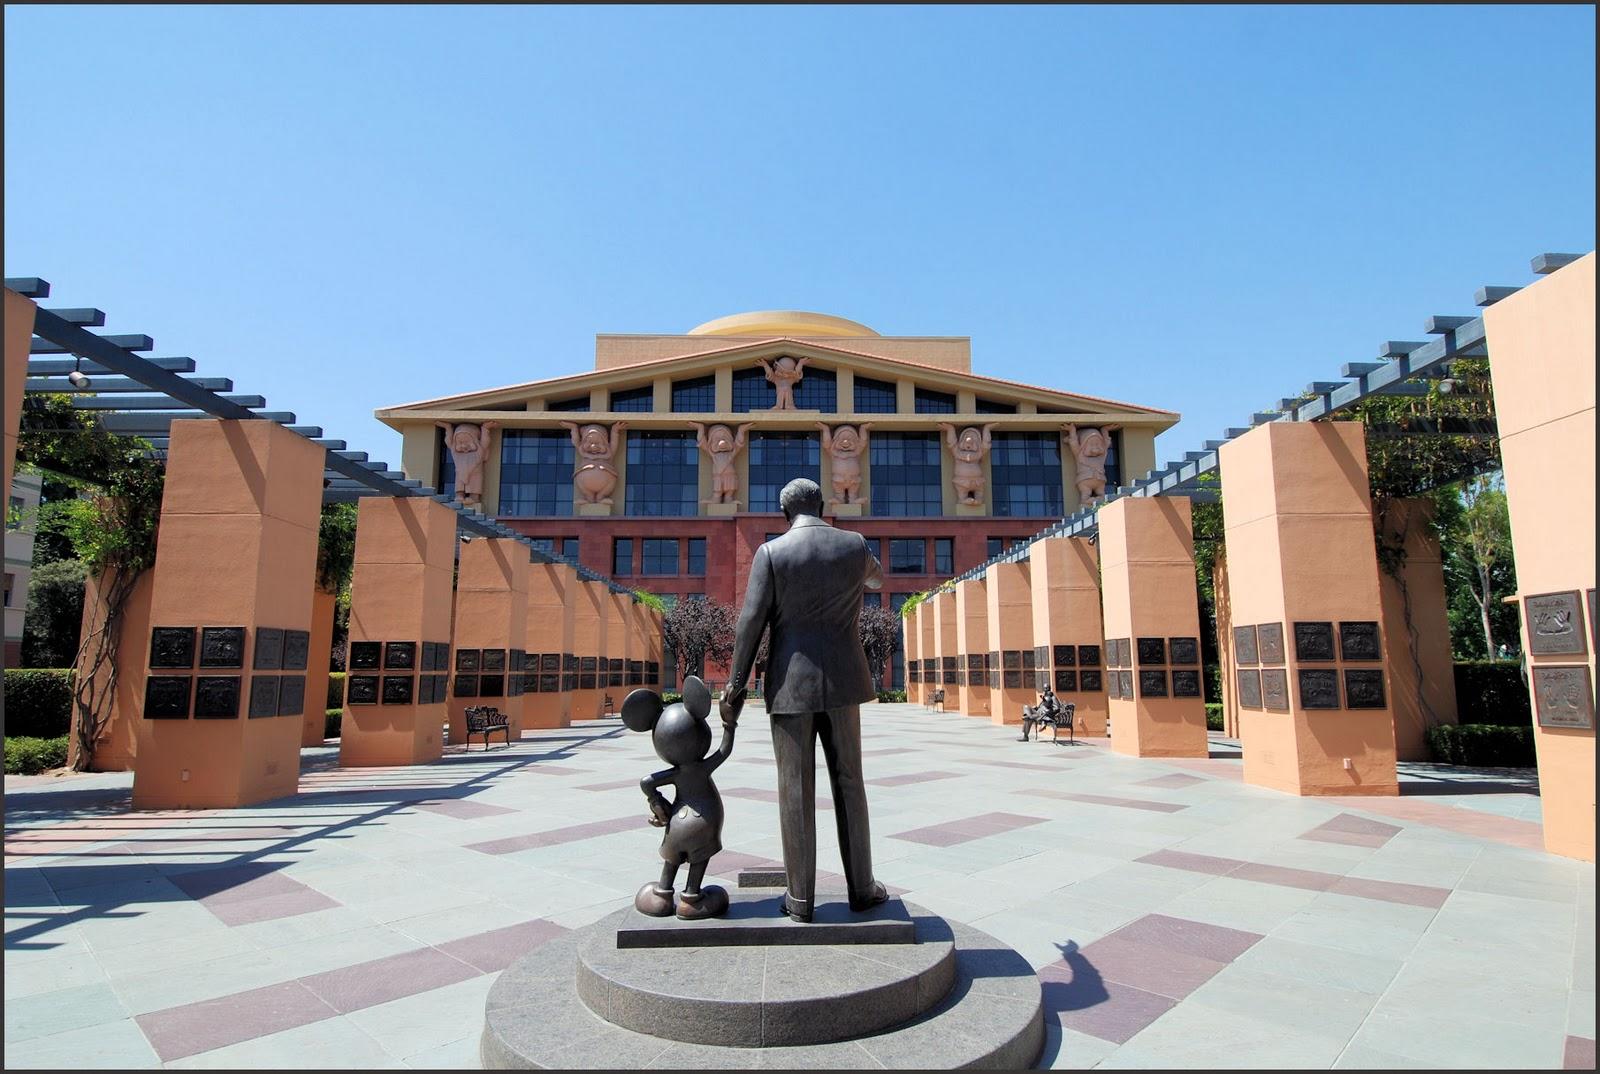 Walt Disney to buy 21st Century Fox's entertainment assets